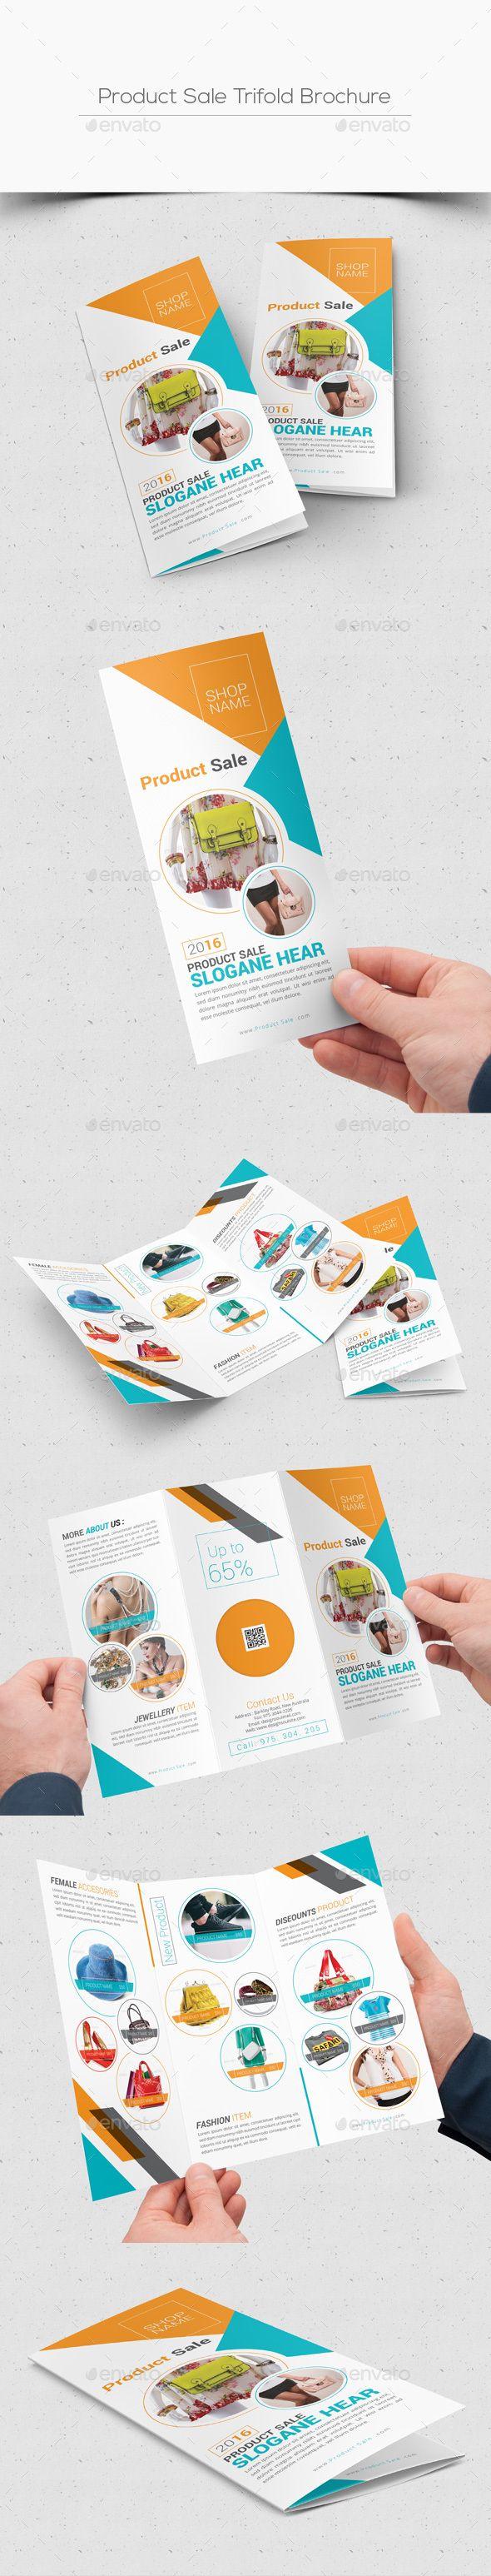 Product Sale Trifold Brochure  — PSD Template #online shop brochure #8.5x11…